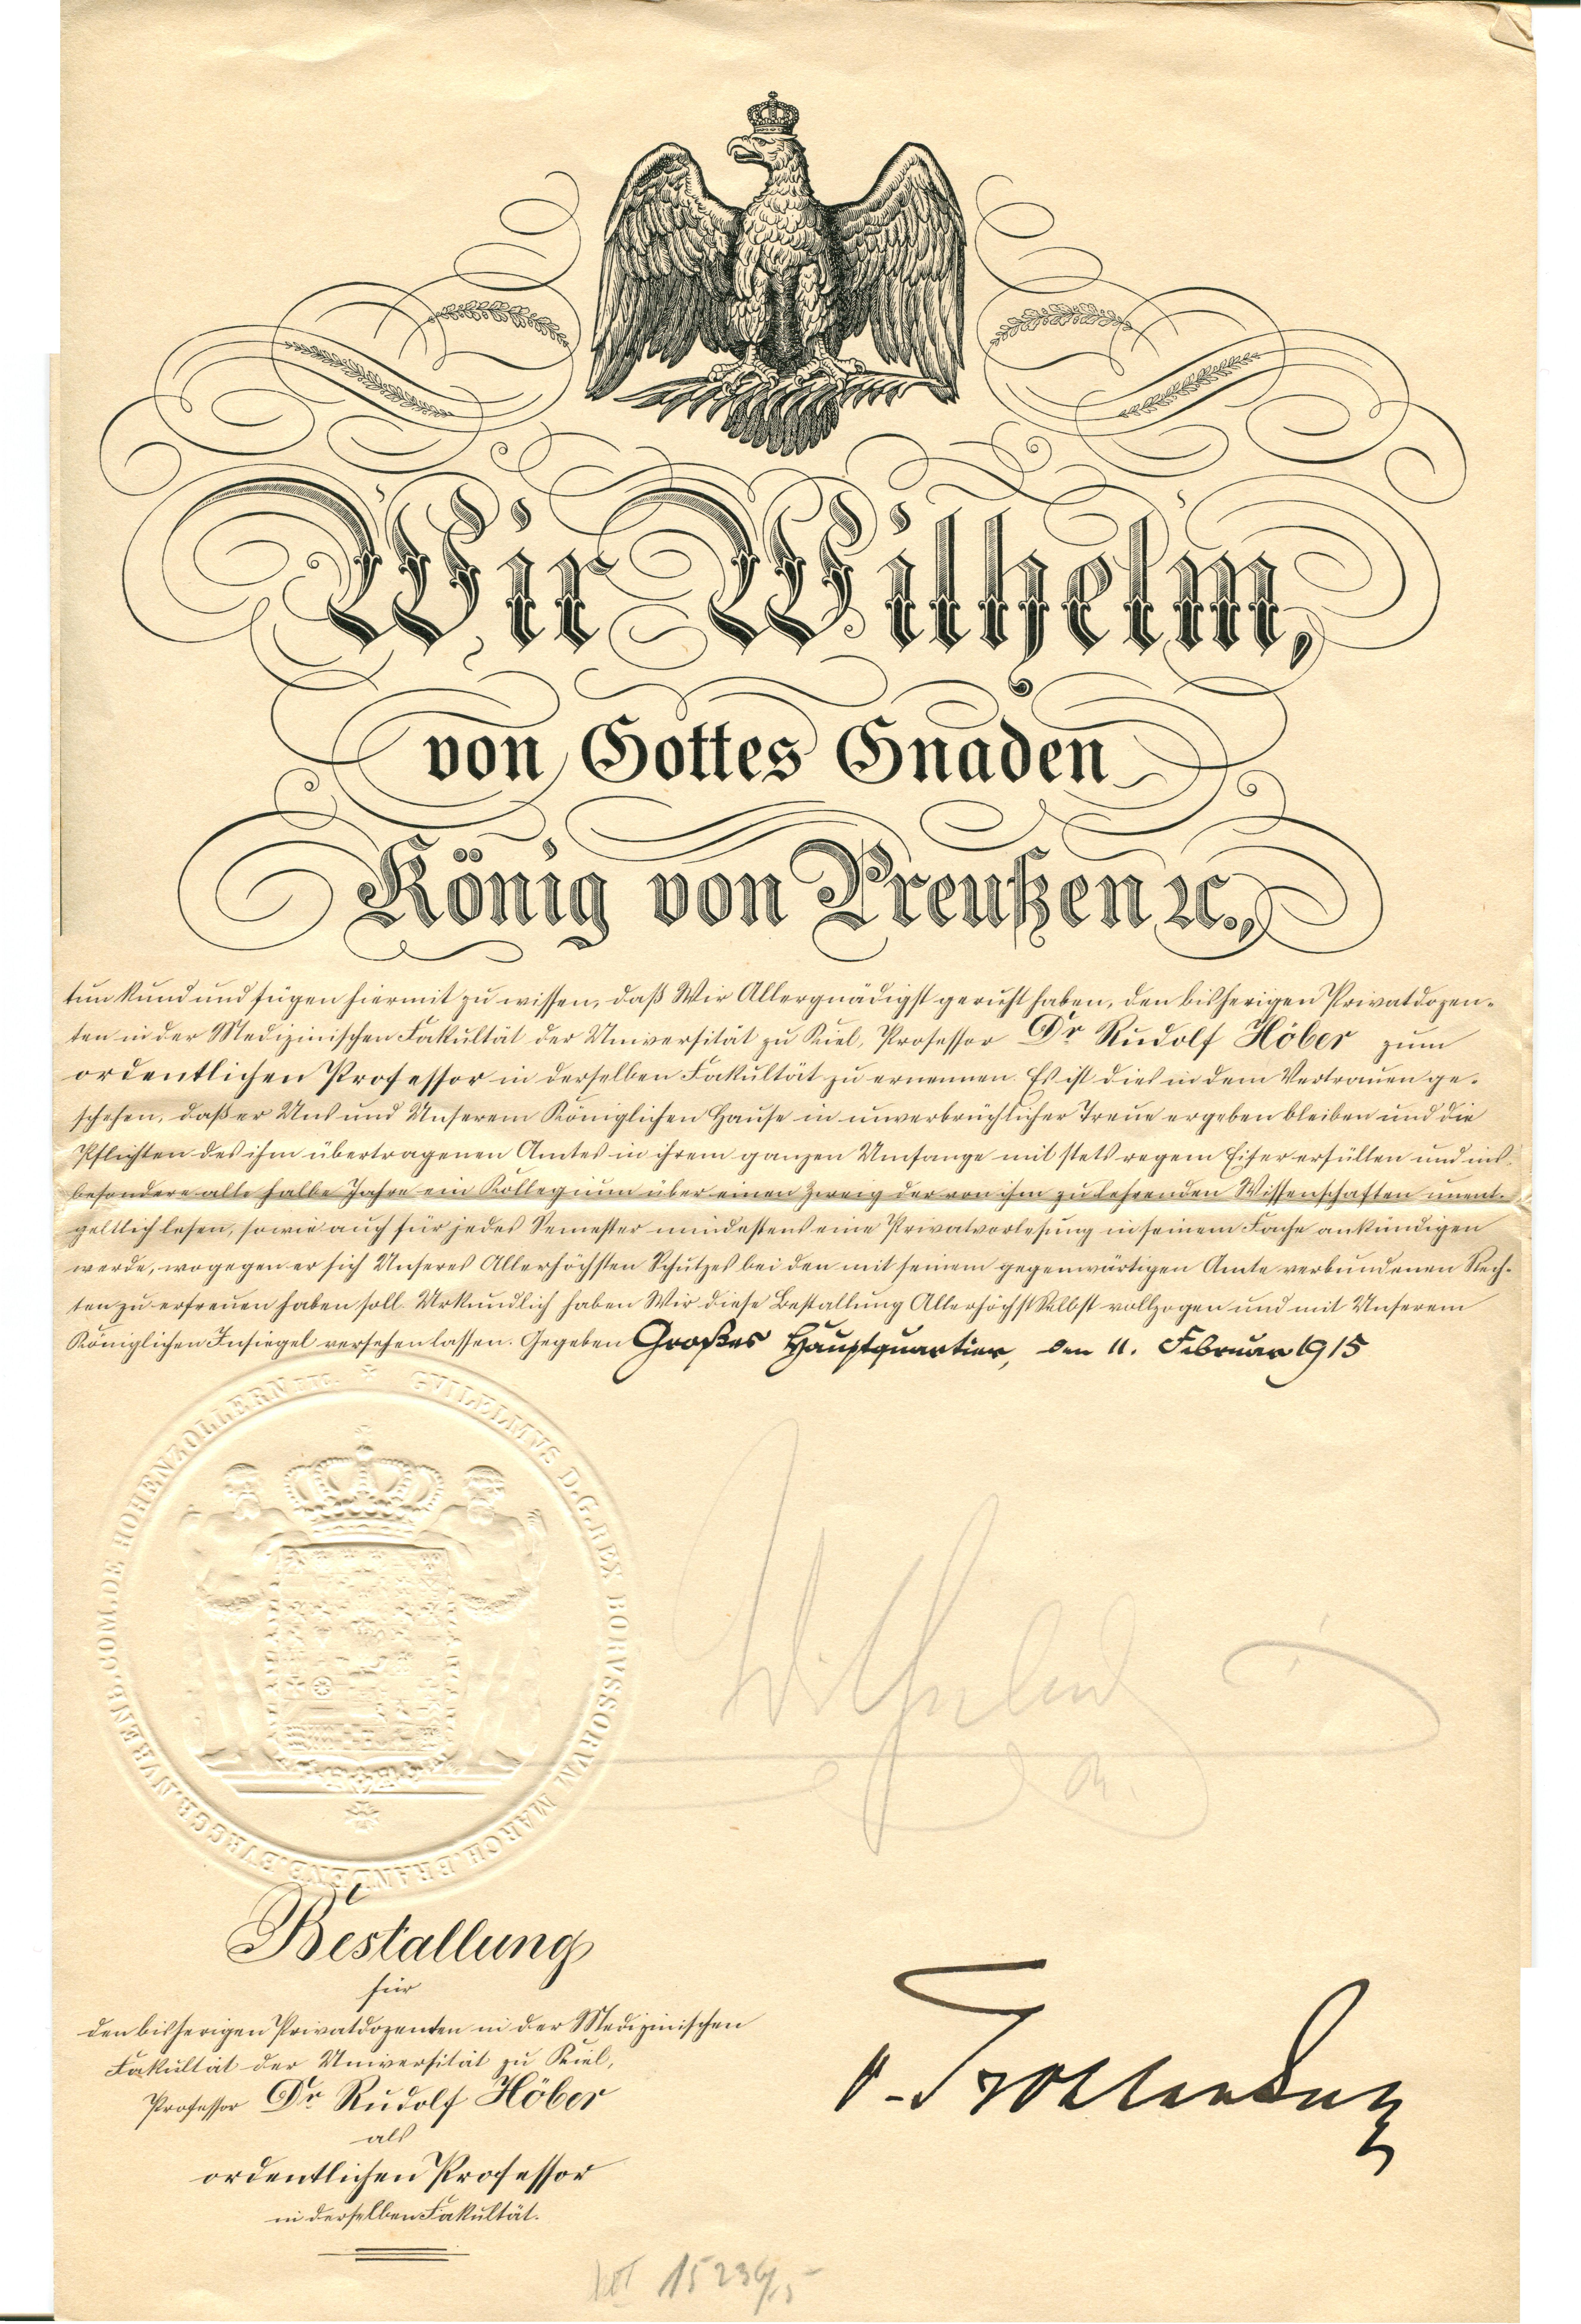 We wilhelm by gods grace king of prussia hoeber rudolf 1betcityfo Gallery